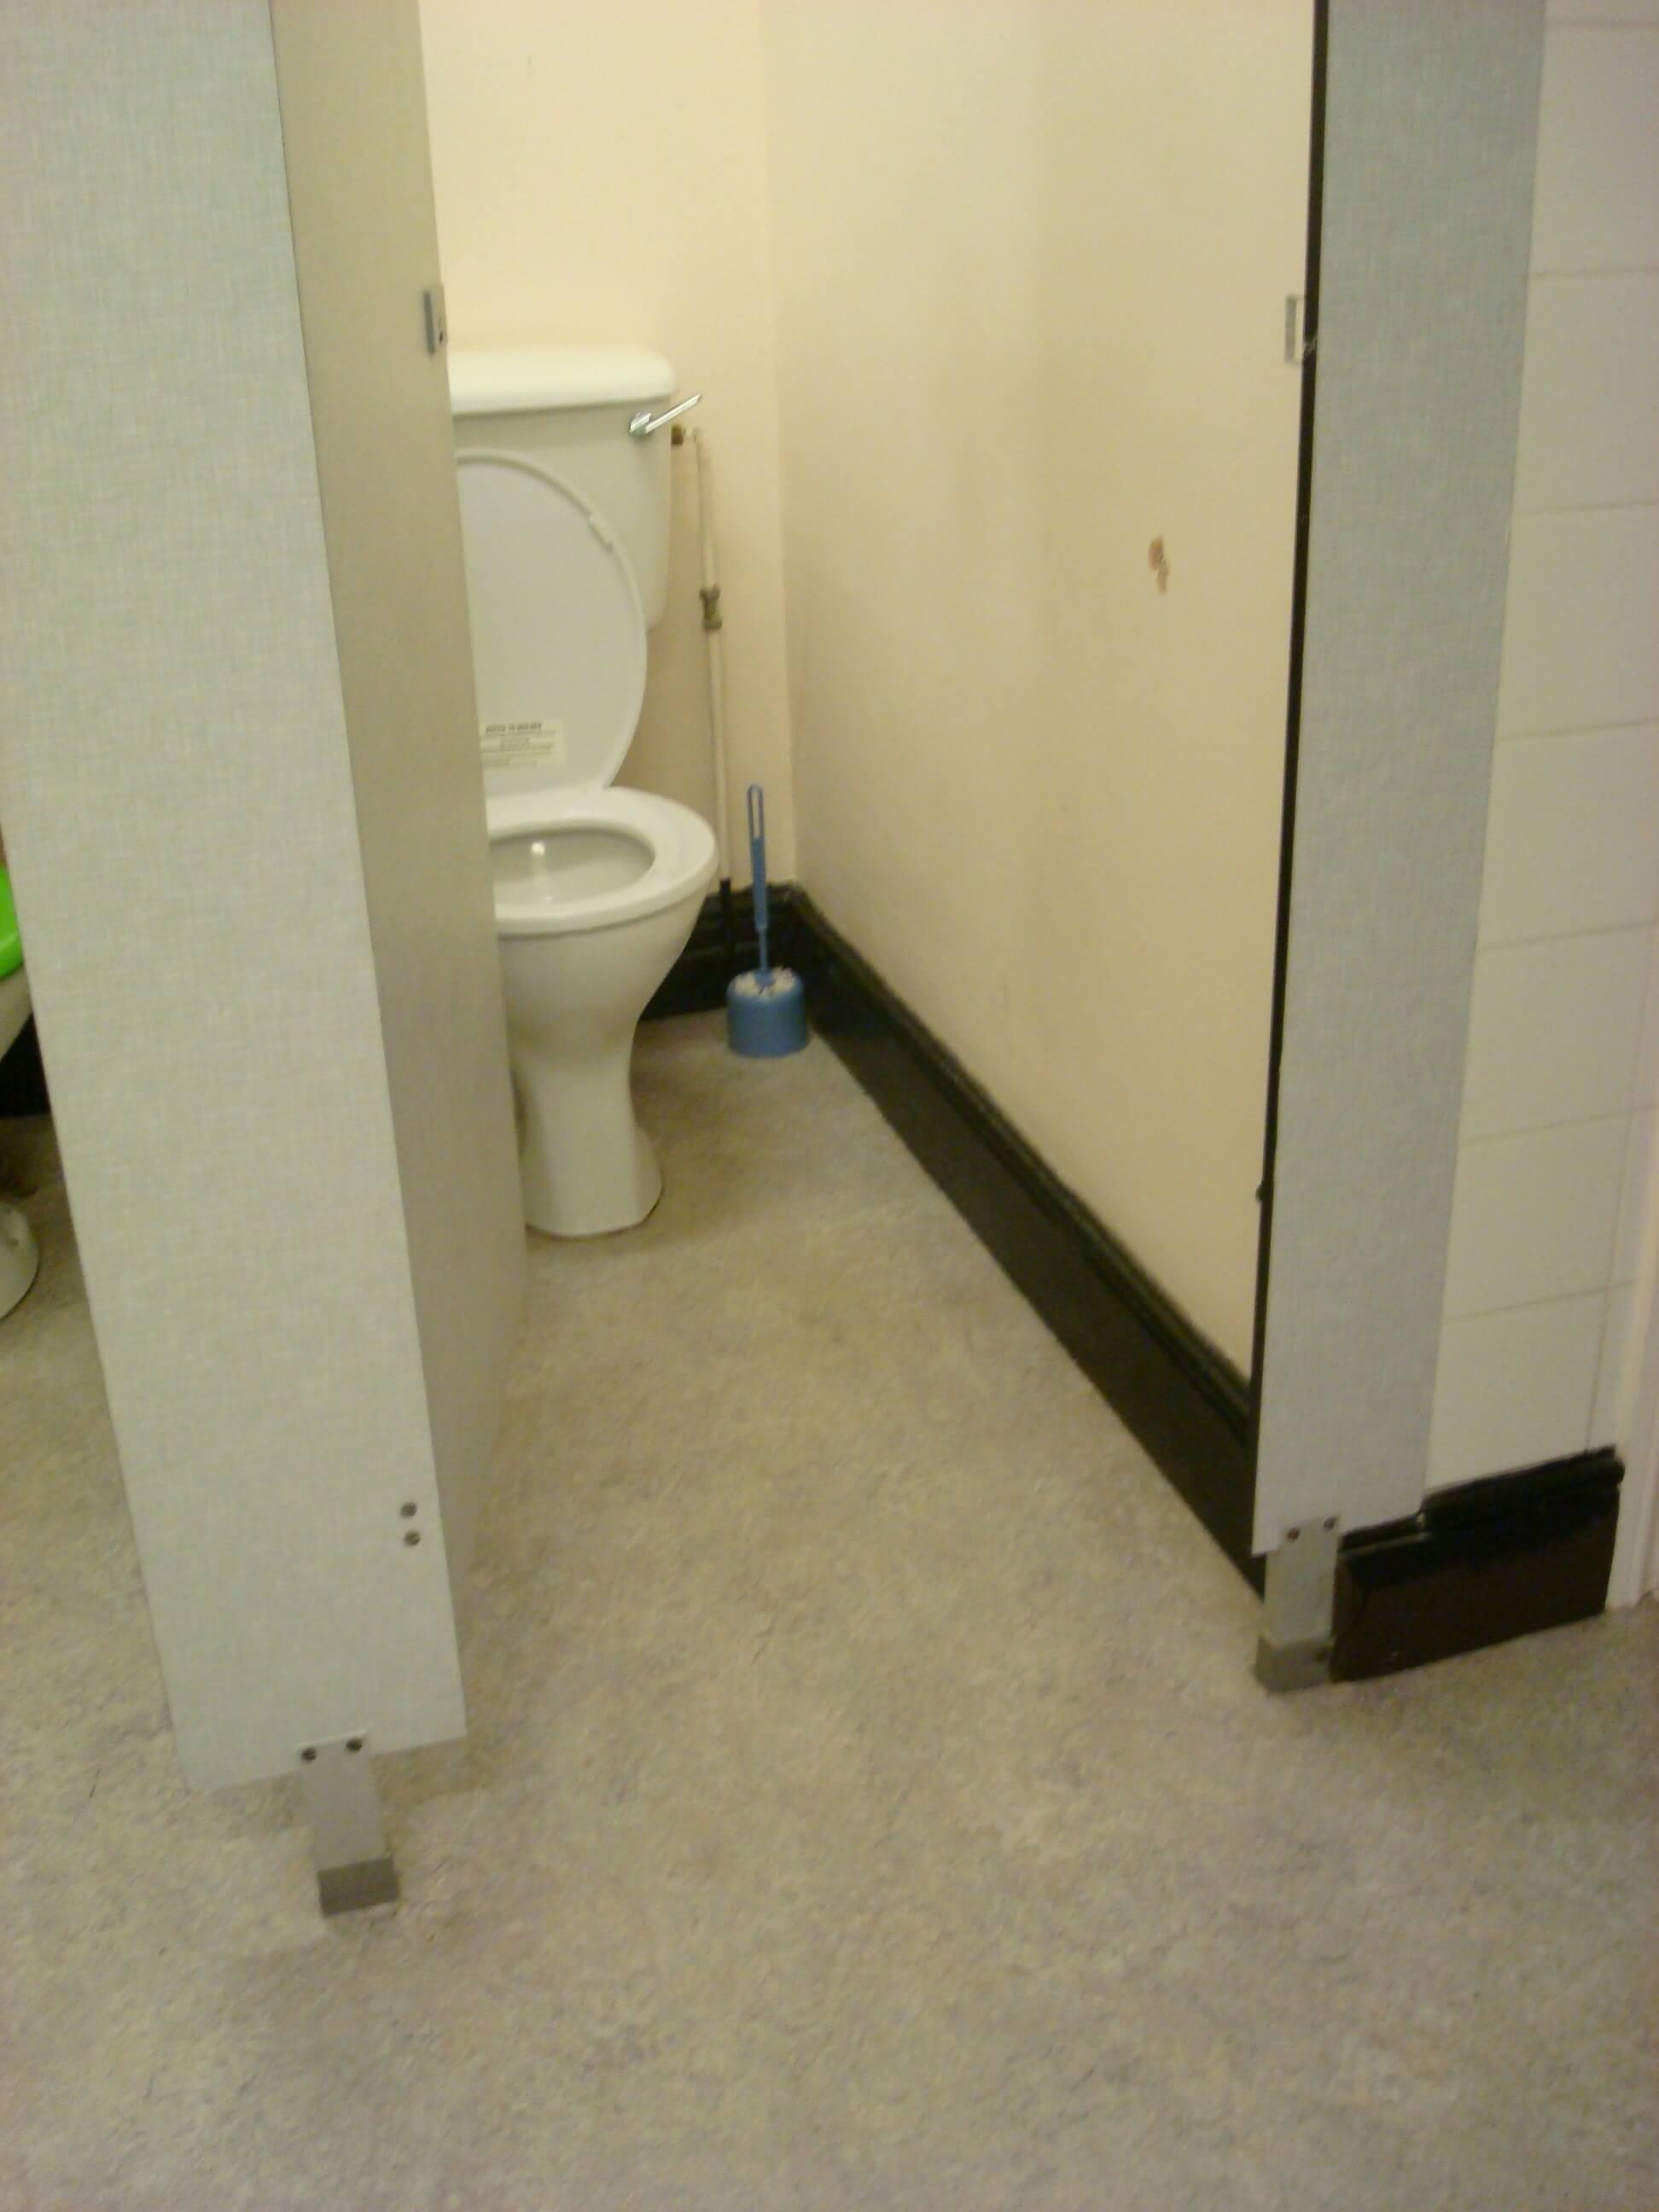 Toilet Refurbishment Pew Hill House in Chiippenham